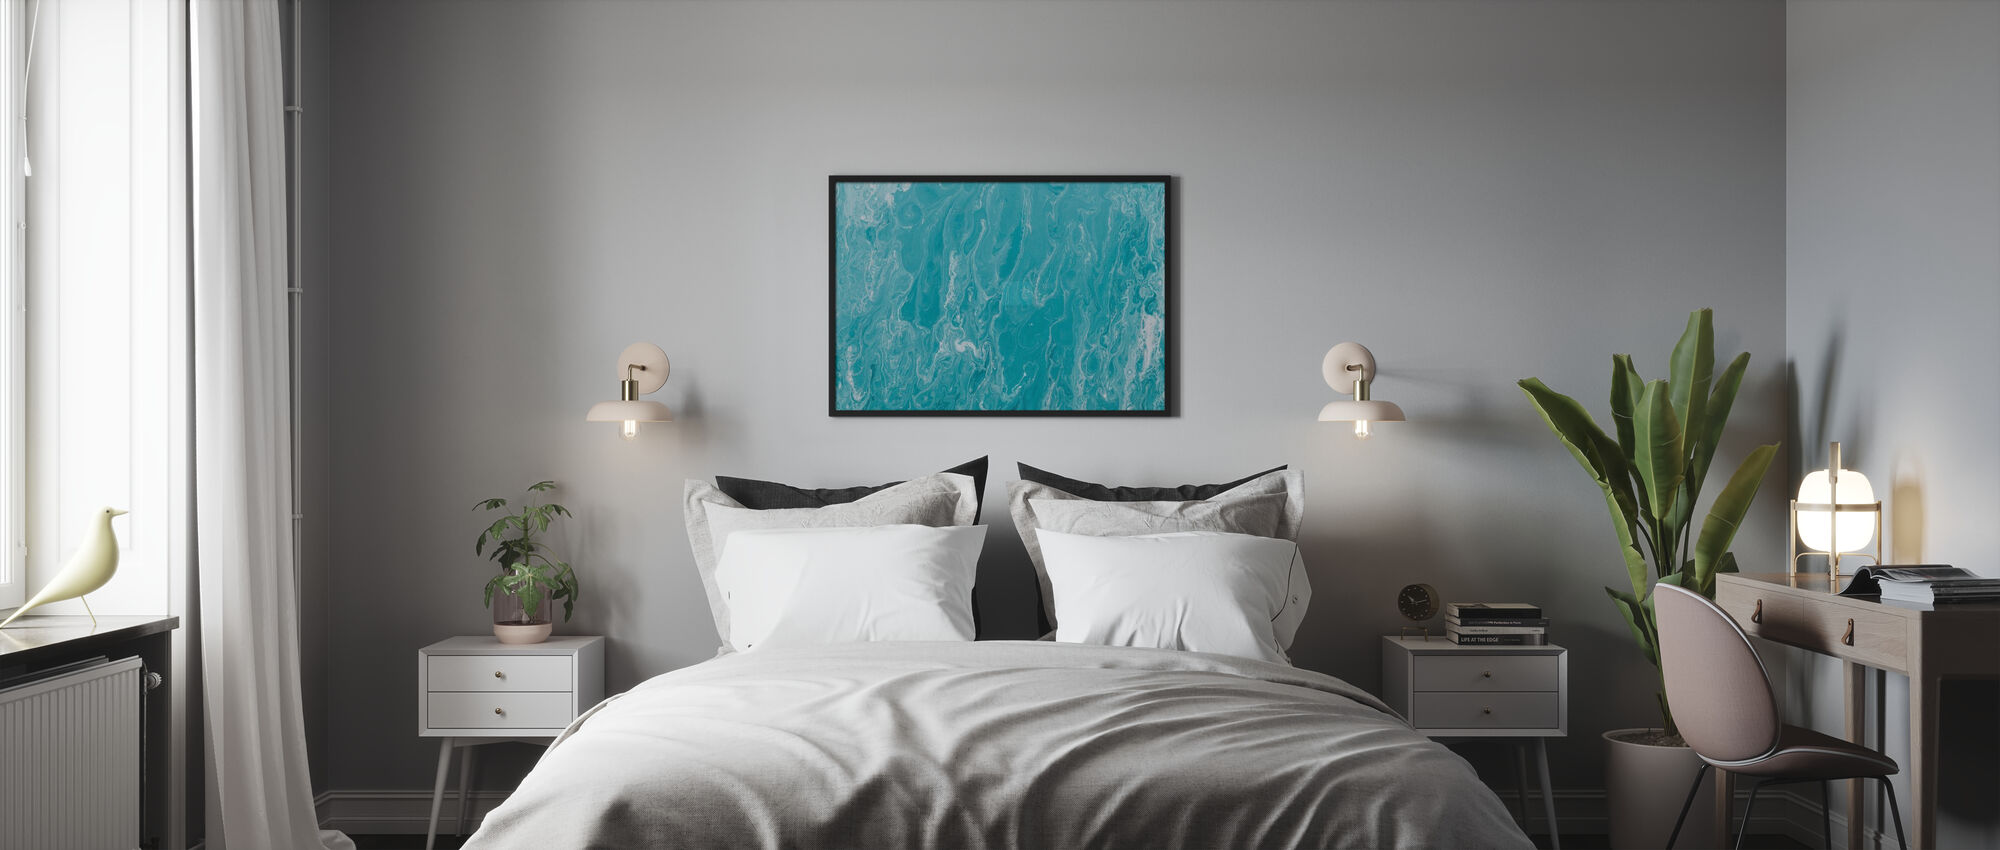 Ocean Like Wallpaper - Poster - Bedroom